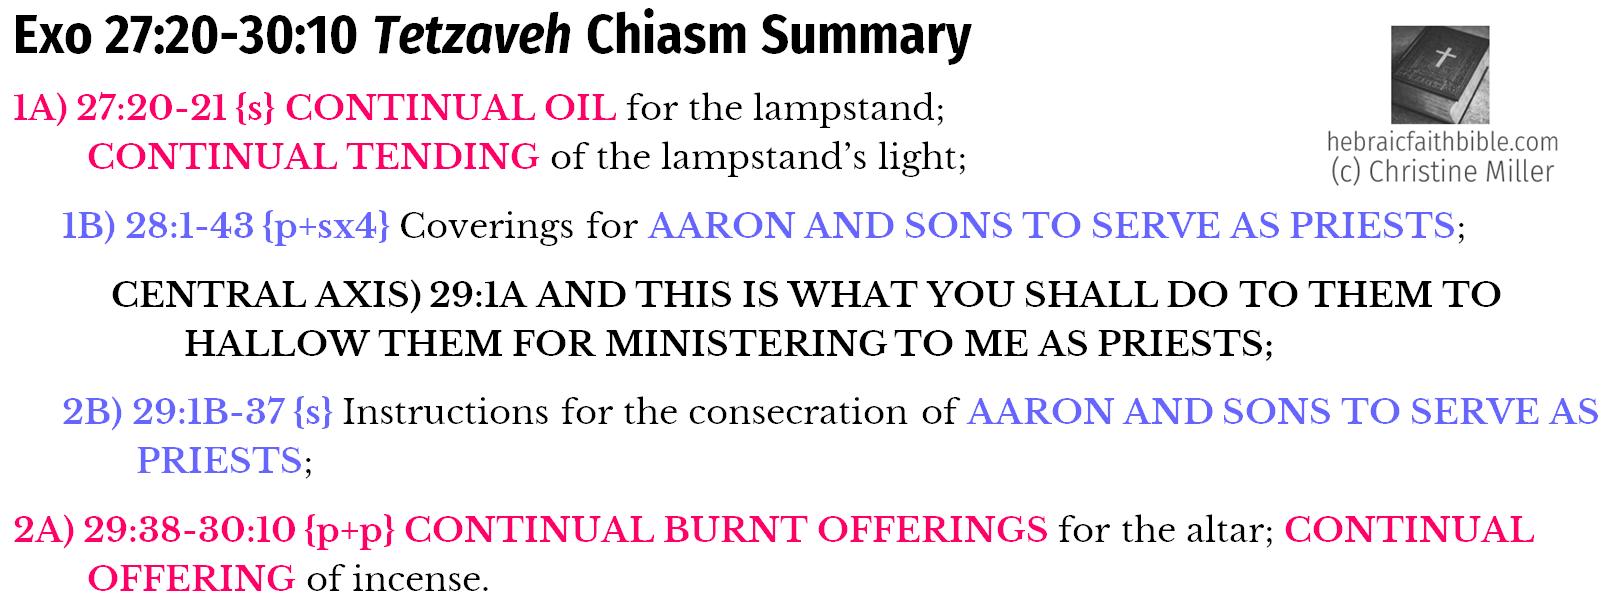 Exo 27:20-30:10 Tetzaveh Chiasm Summery   hebriacfaithbible.com